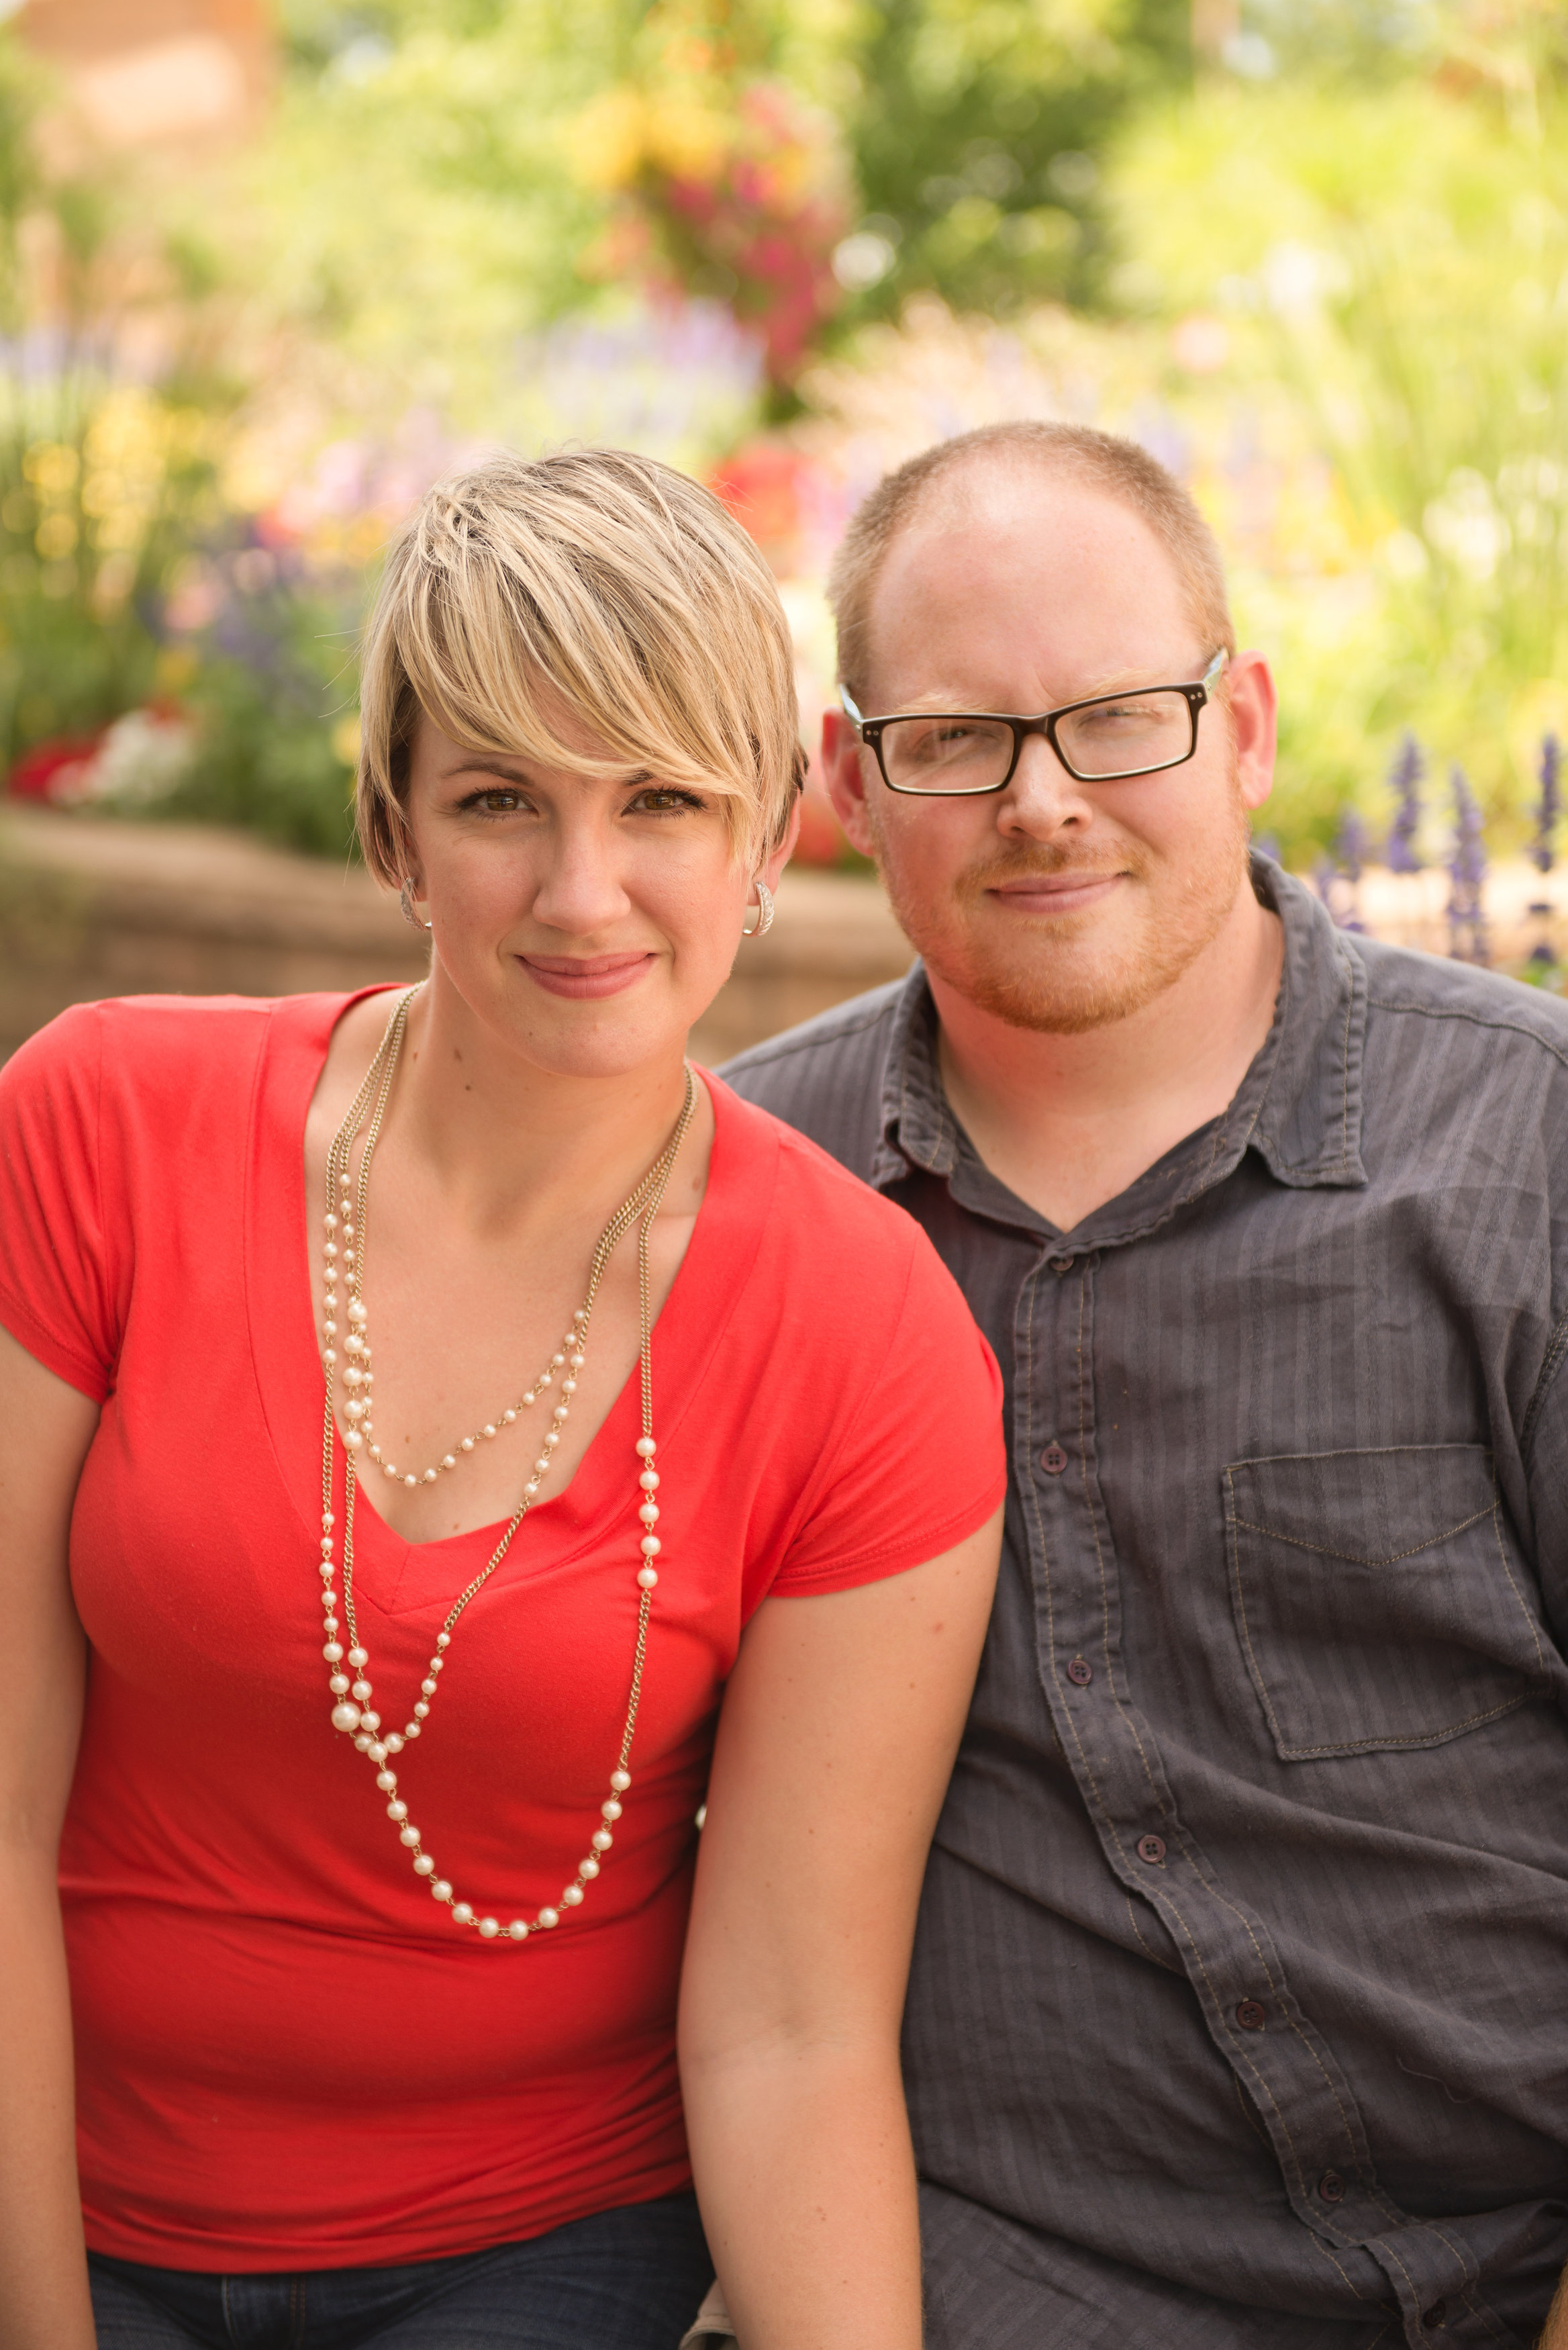 Orlando-couple-red.jpg